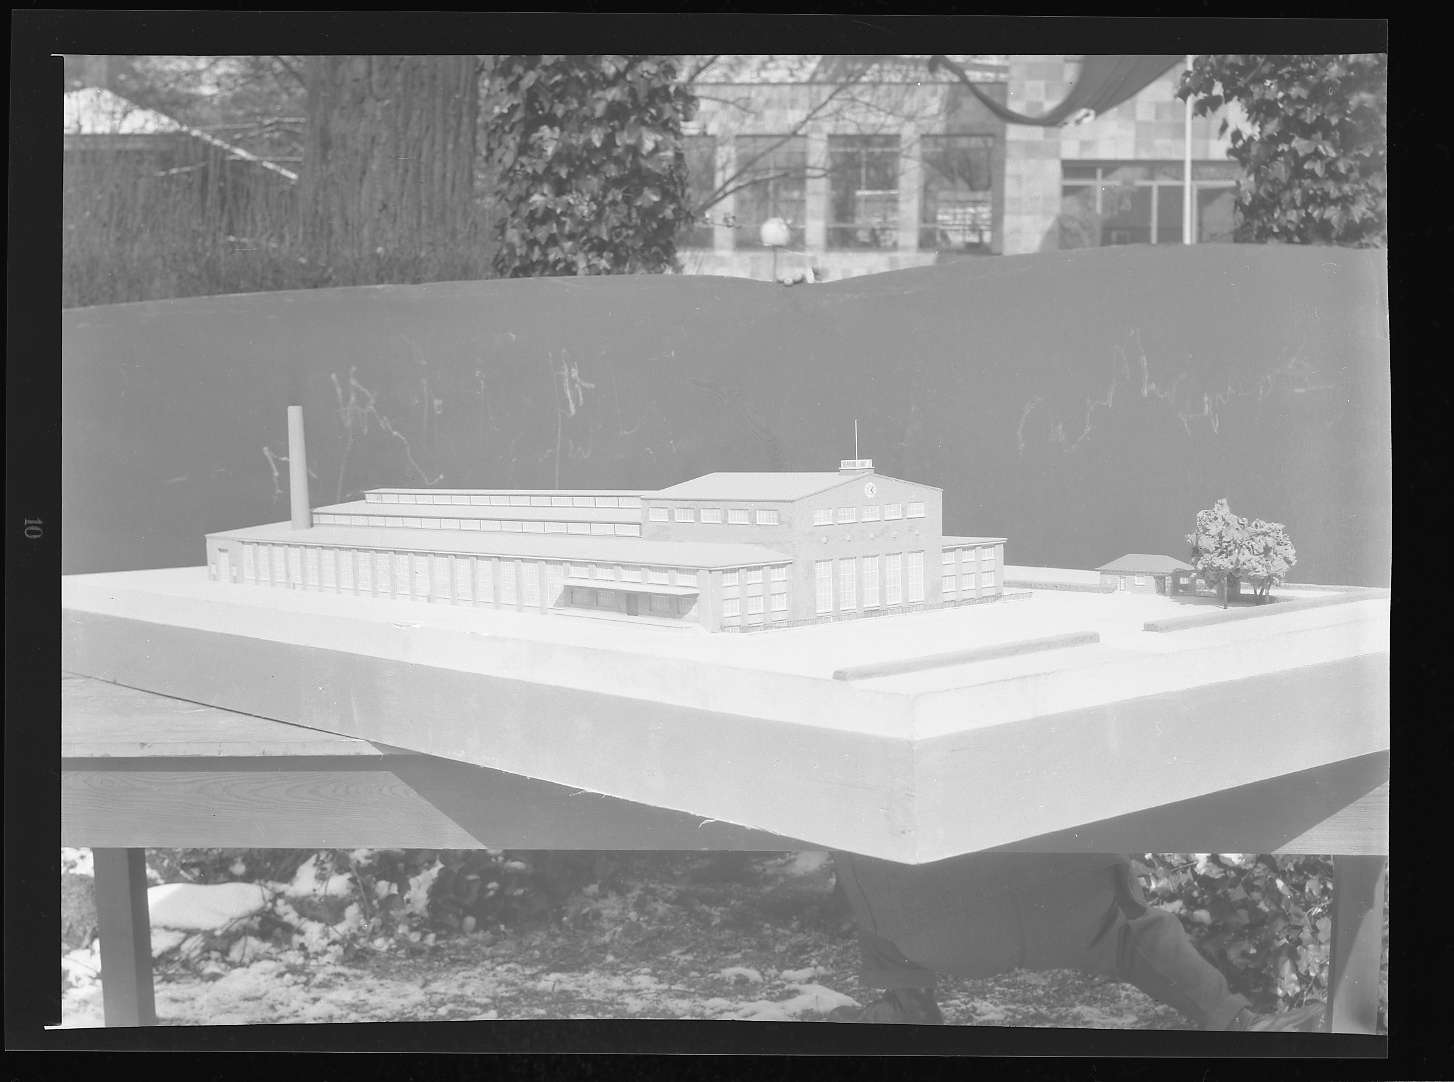 Kornwestheim, Zentralschmiede, Architekturmodell 3, Abb. a